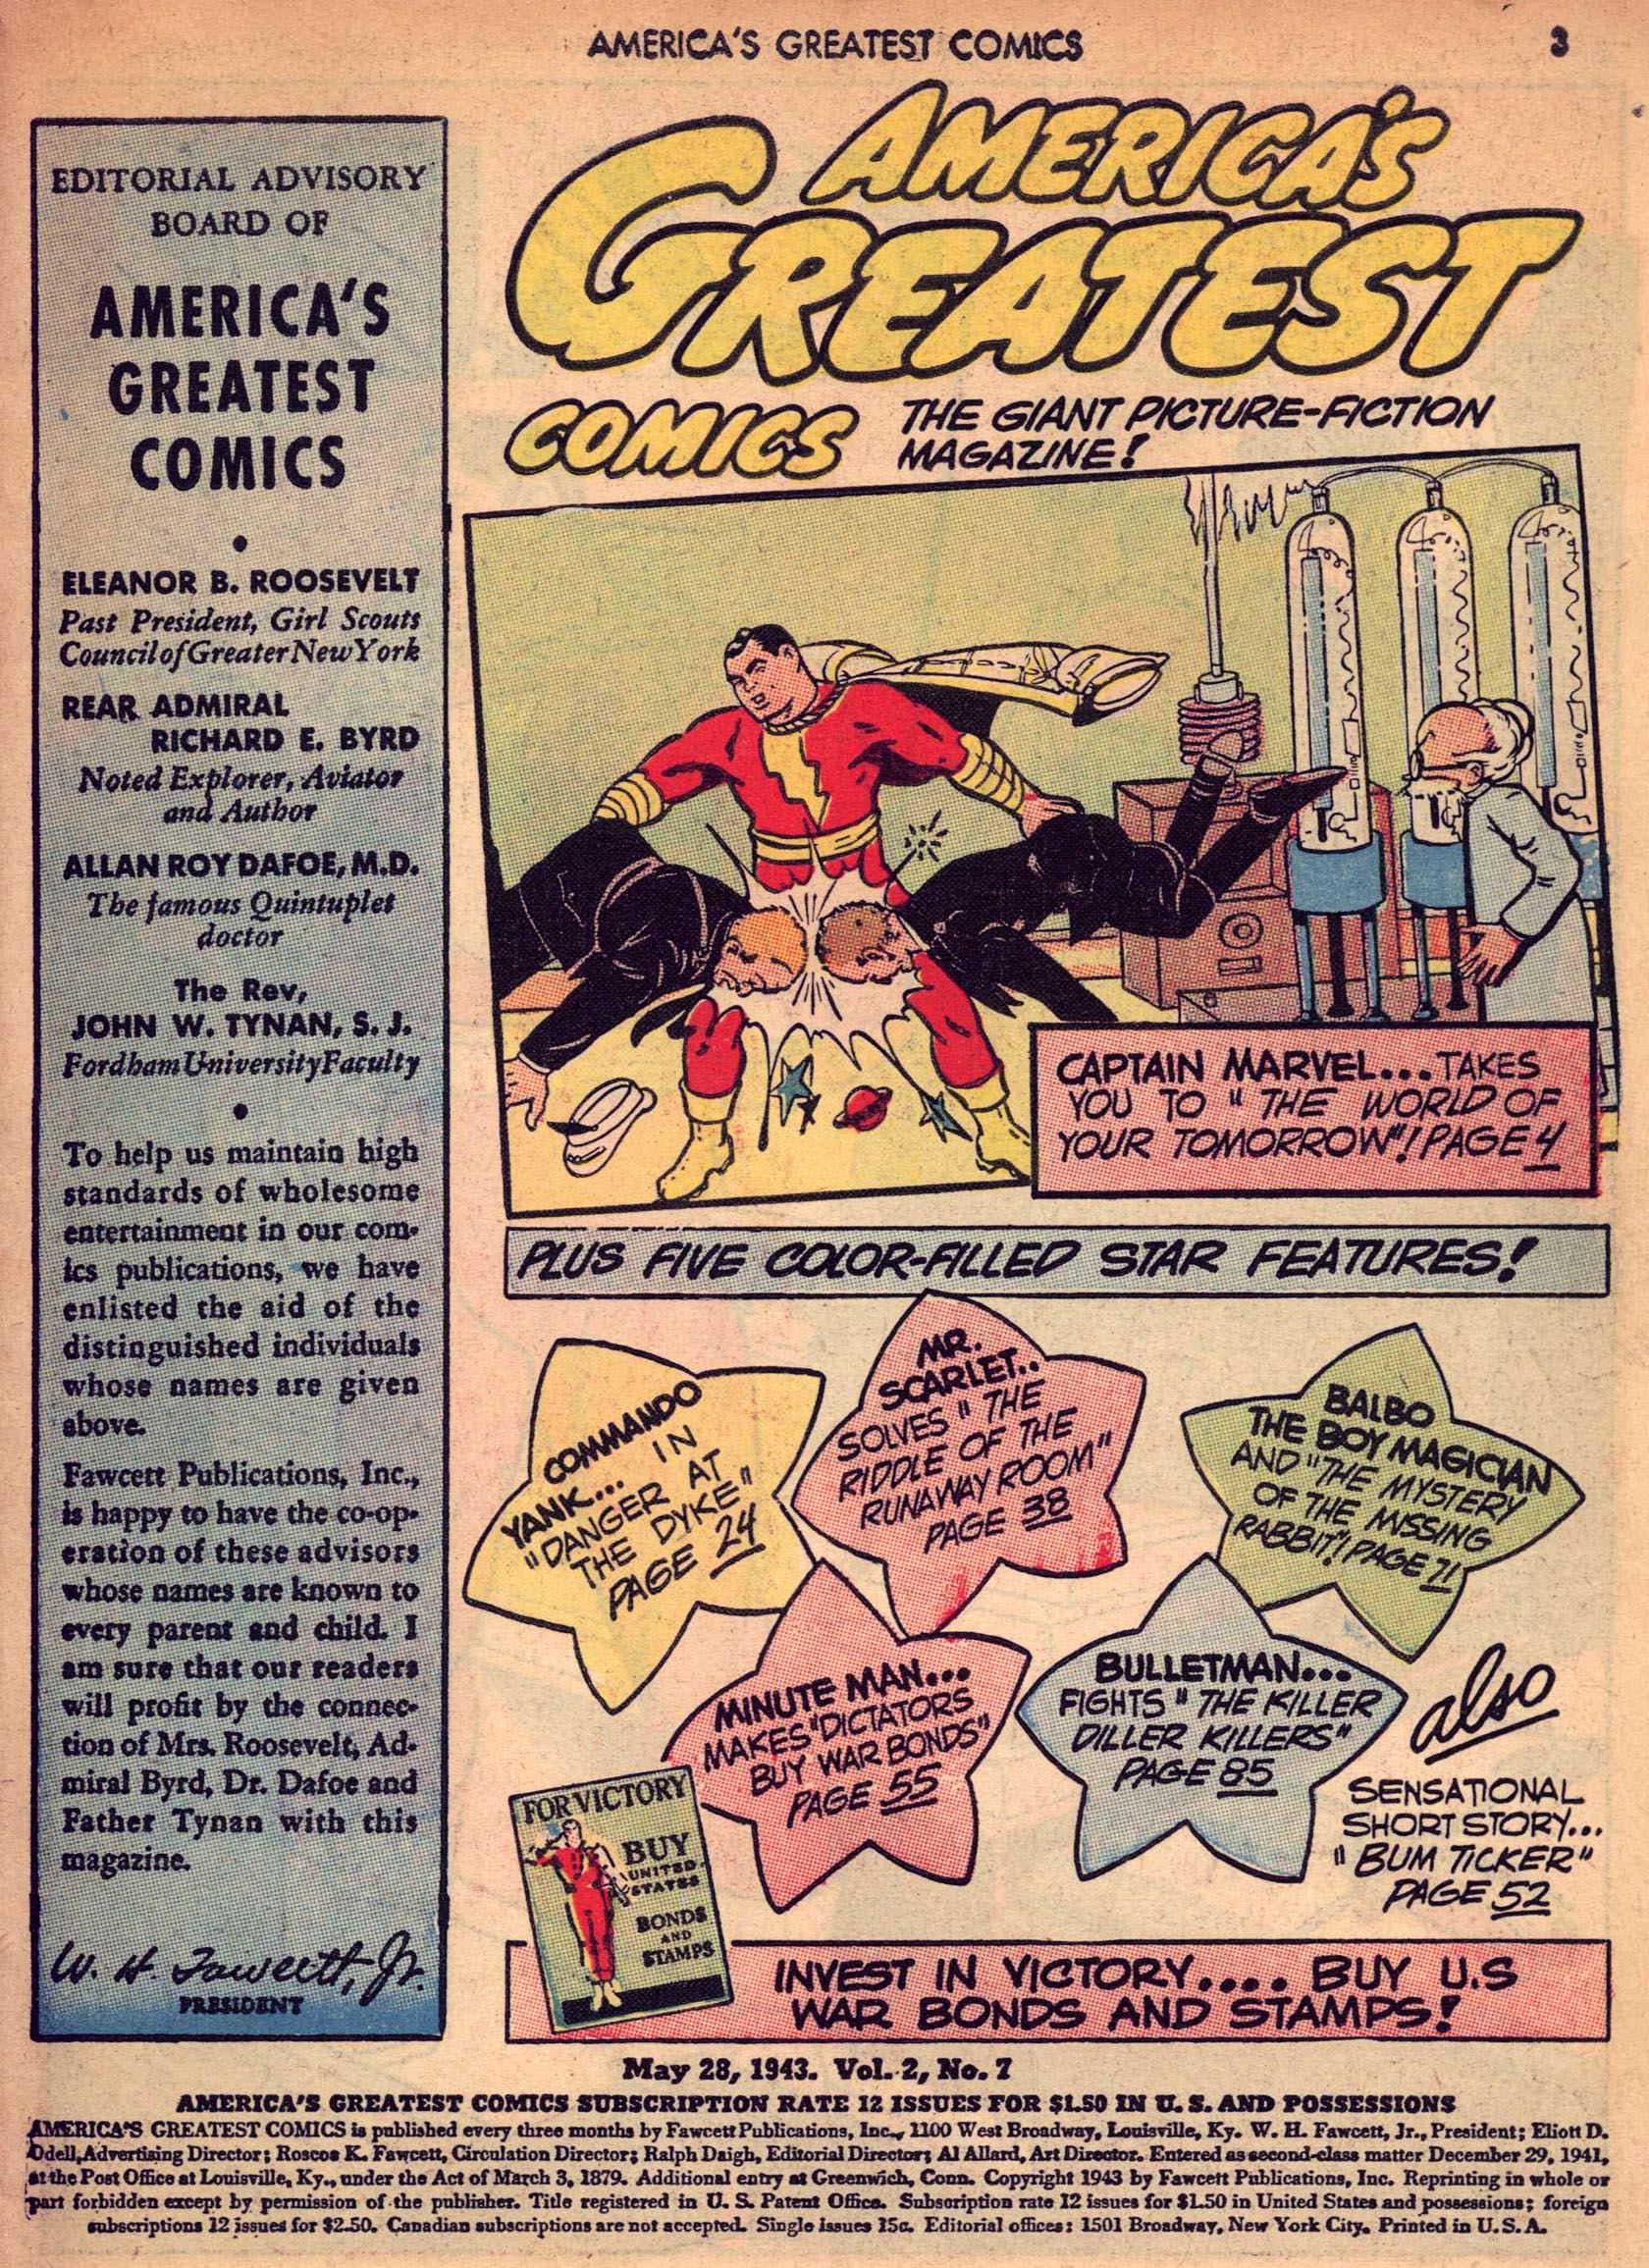 Read online America's Greatest Comics comic -  Issue #7 - 3